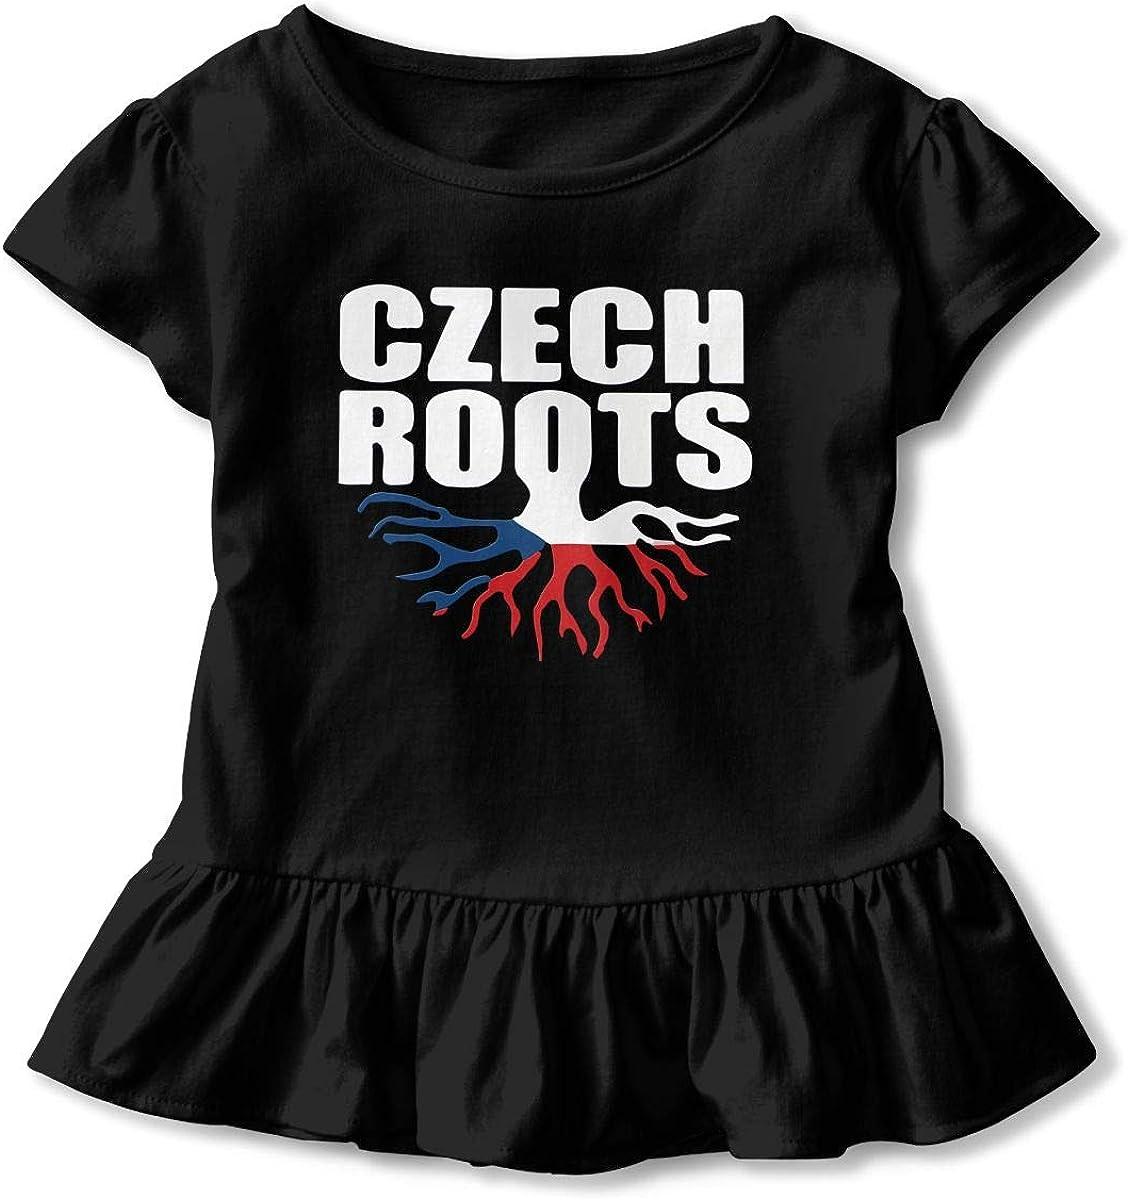 Cheng Jian Bo Czech Roots Toddler Girls T Shirt Kids Cotton Short Sleeve Ruffle Tee